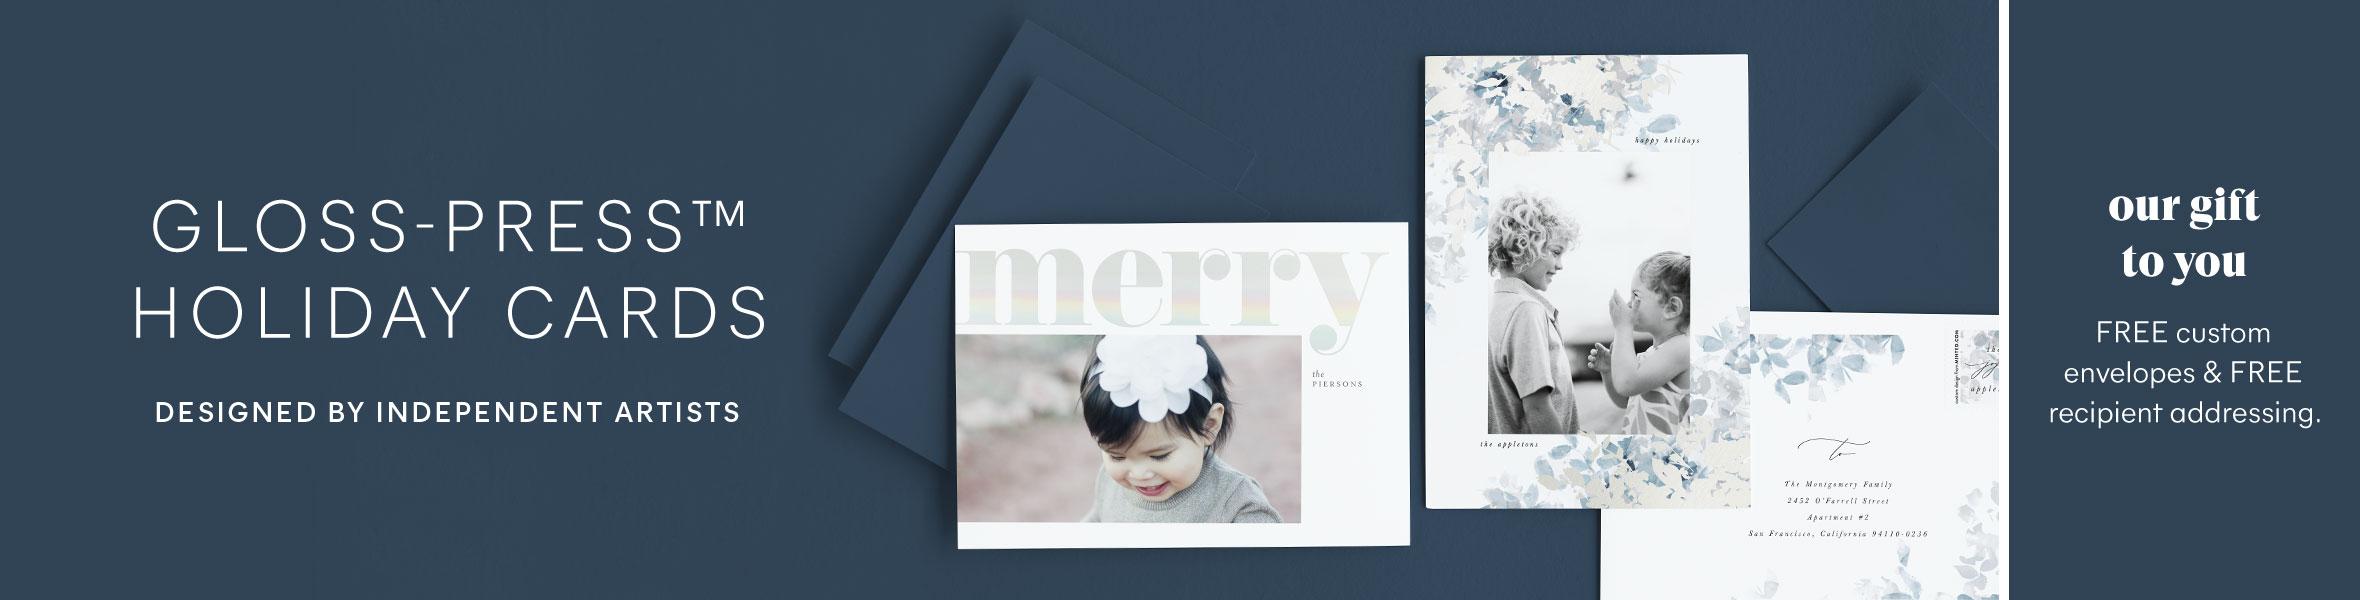 Gloss Press Photo Cards